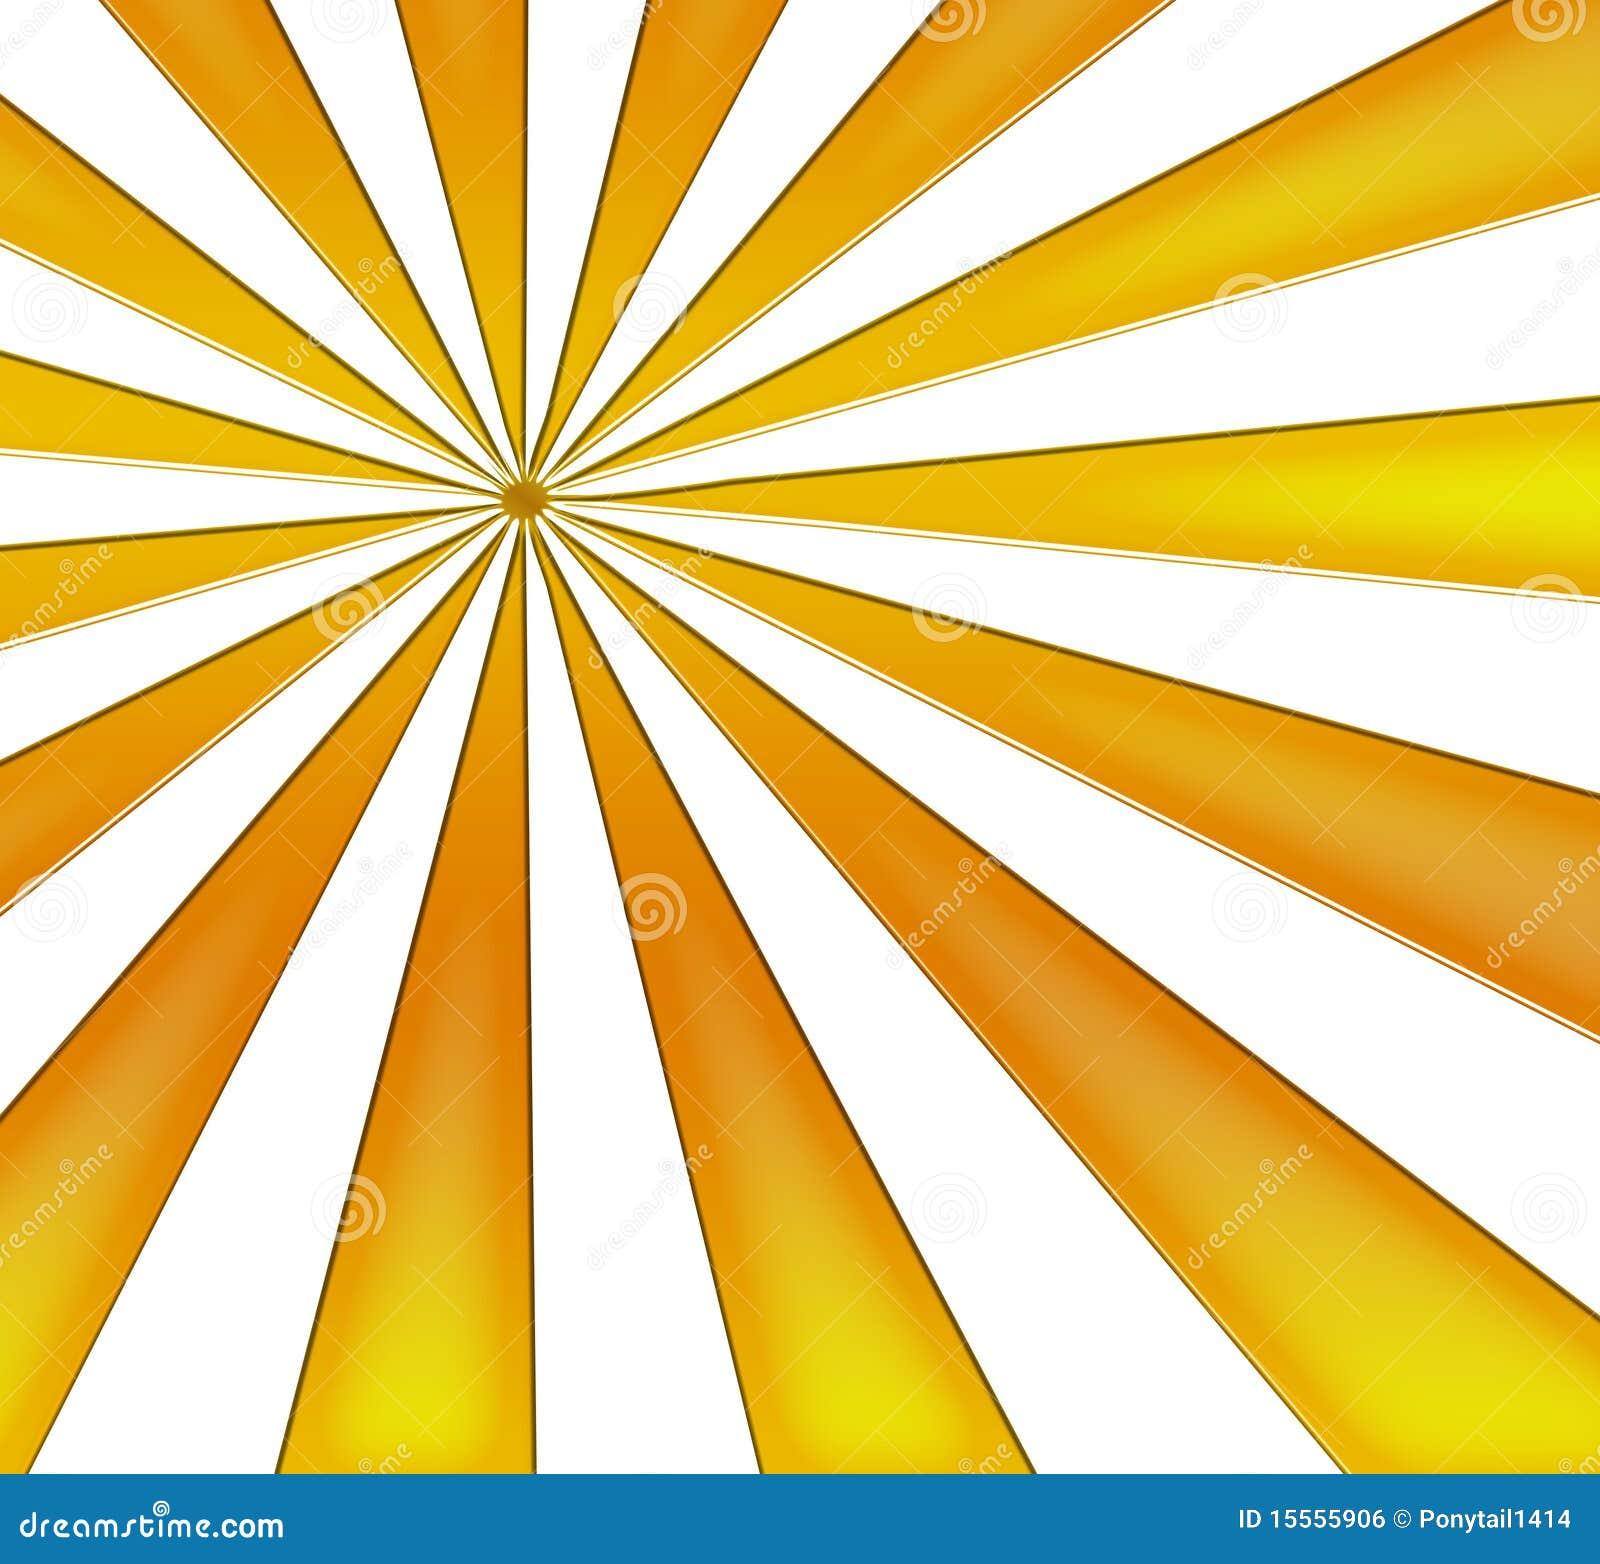 yellow rays vector - photo #37